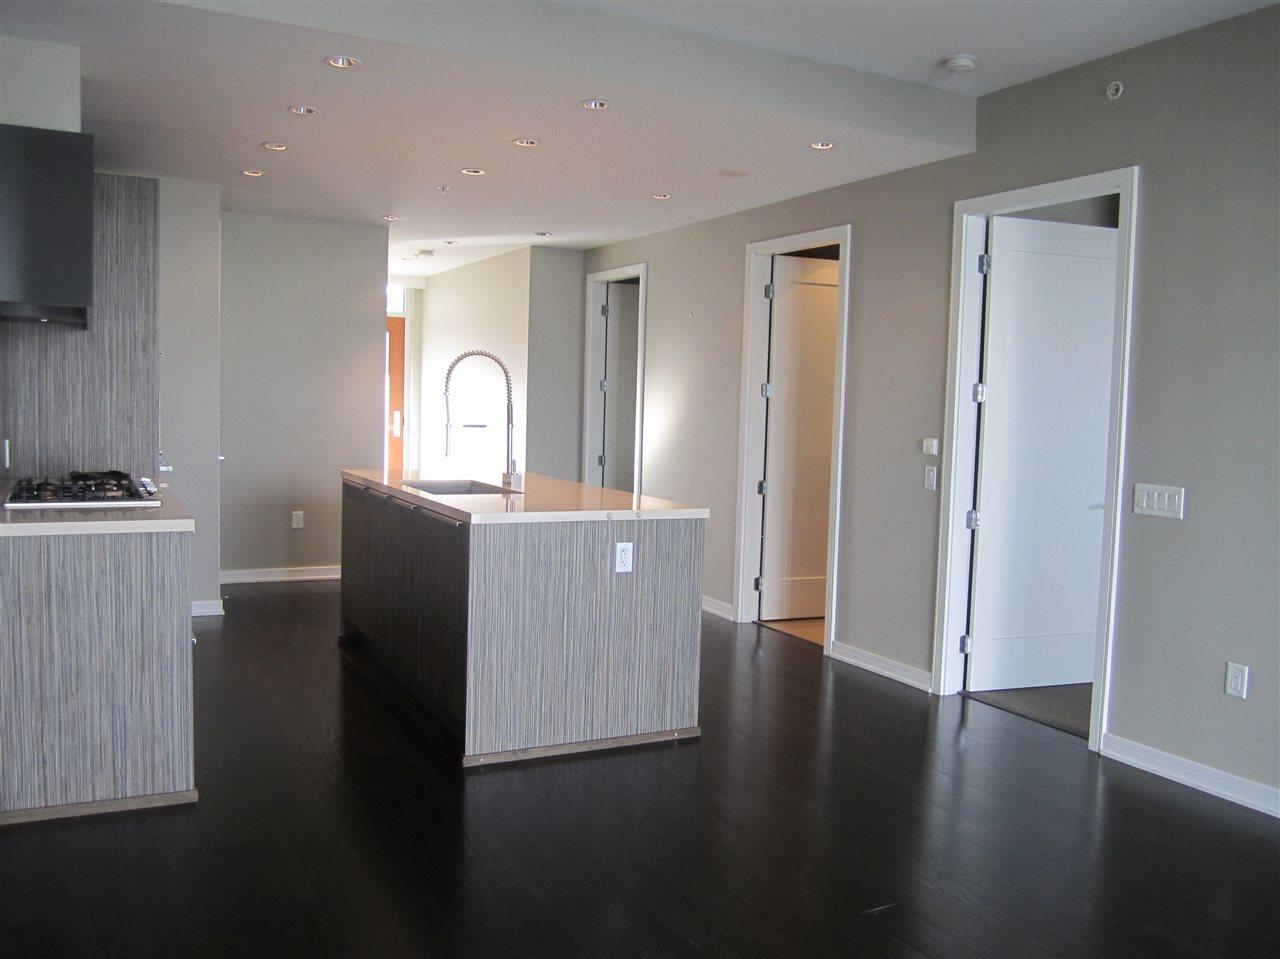 Condo Apartment at 405 12 ATHLETES WAY, Unit 405, Vancouver West, British Columbia. Image 7